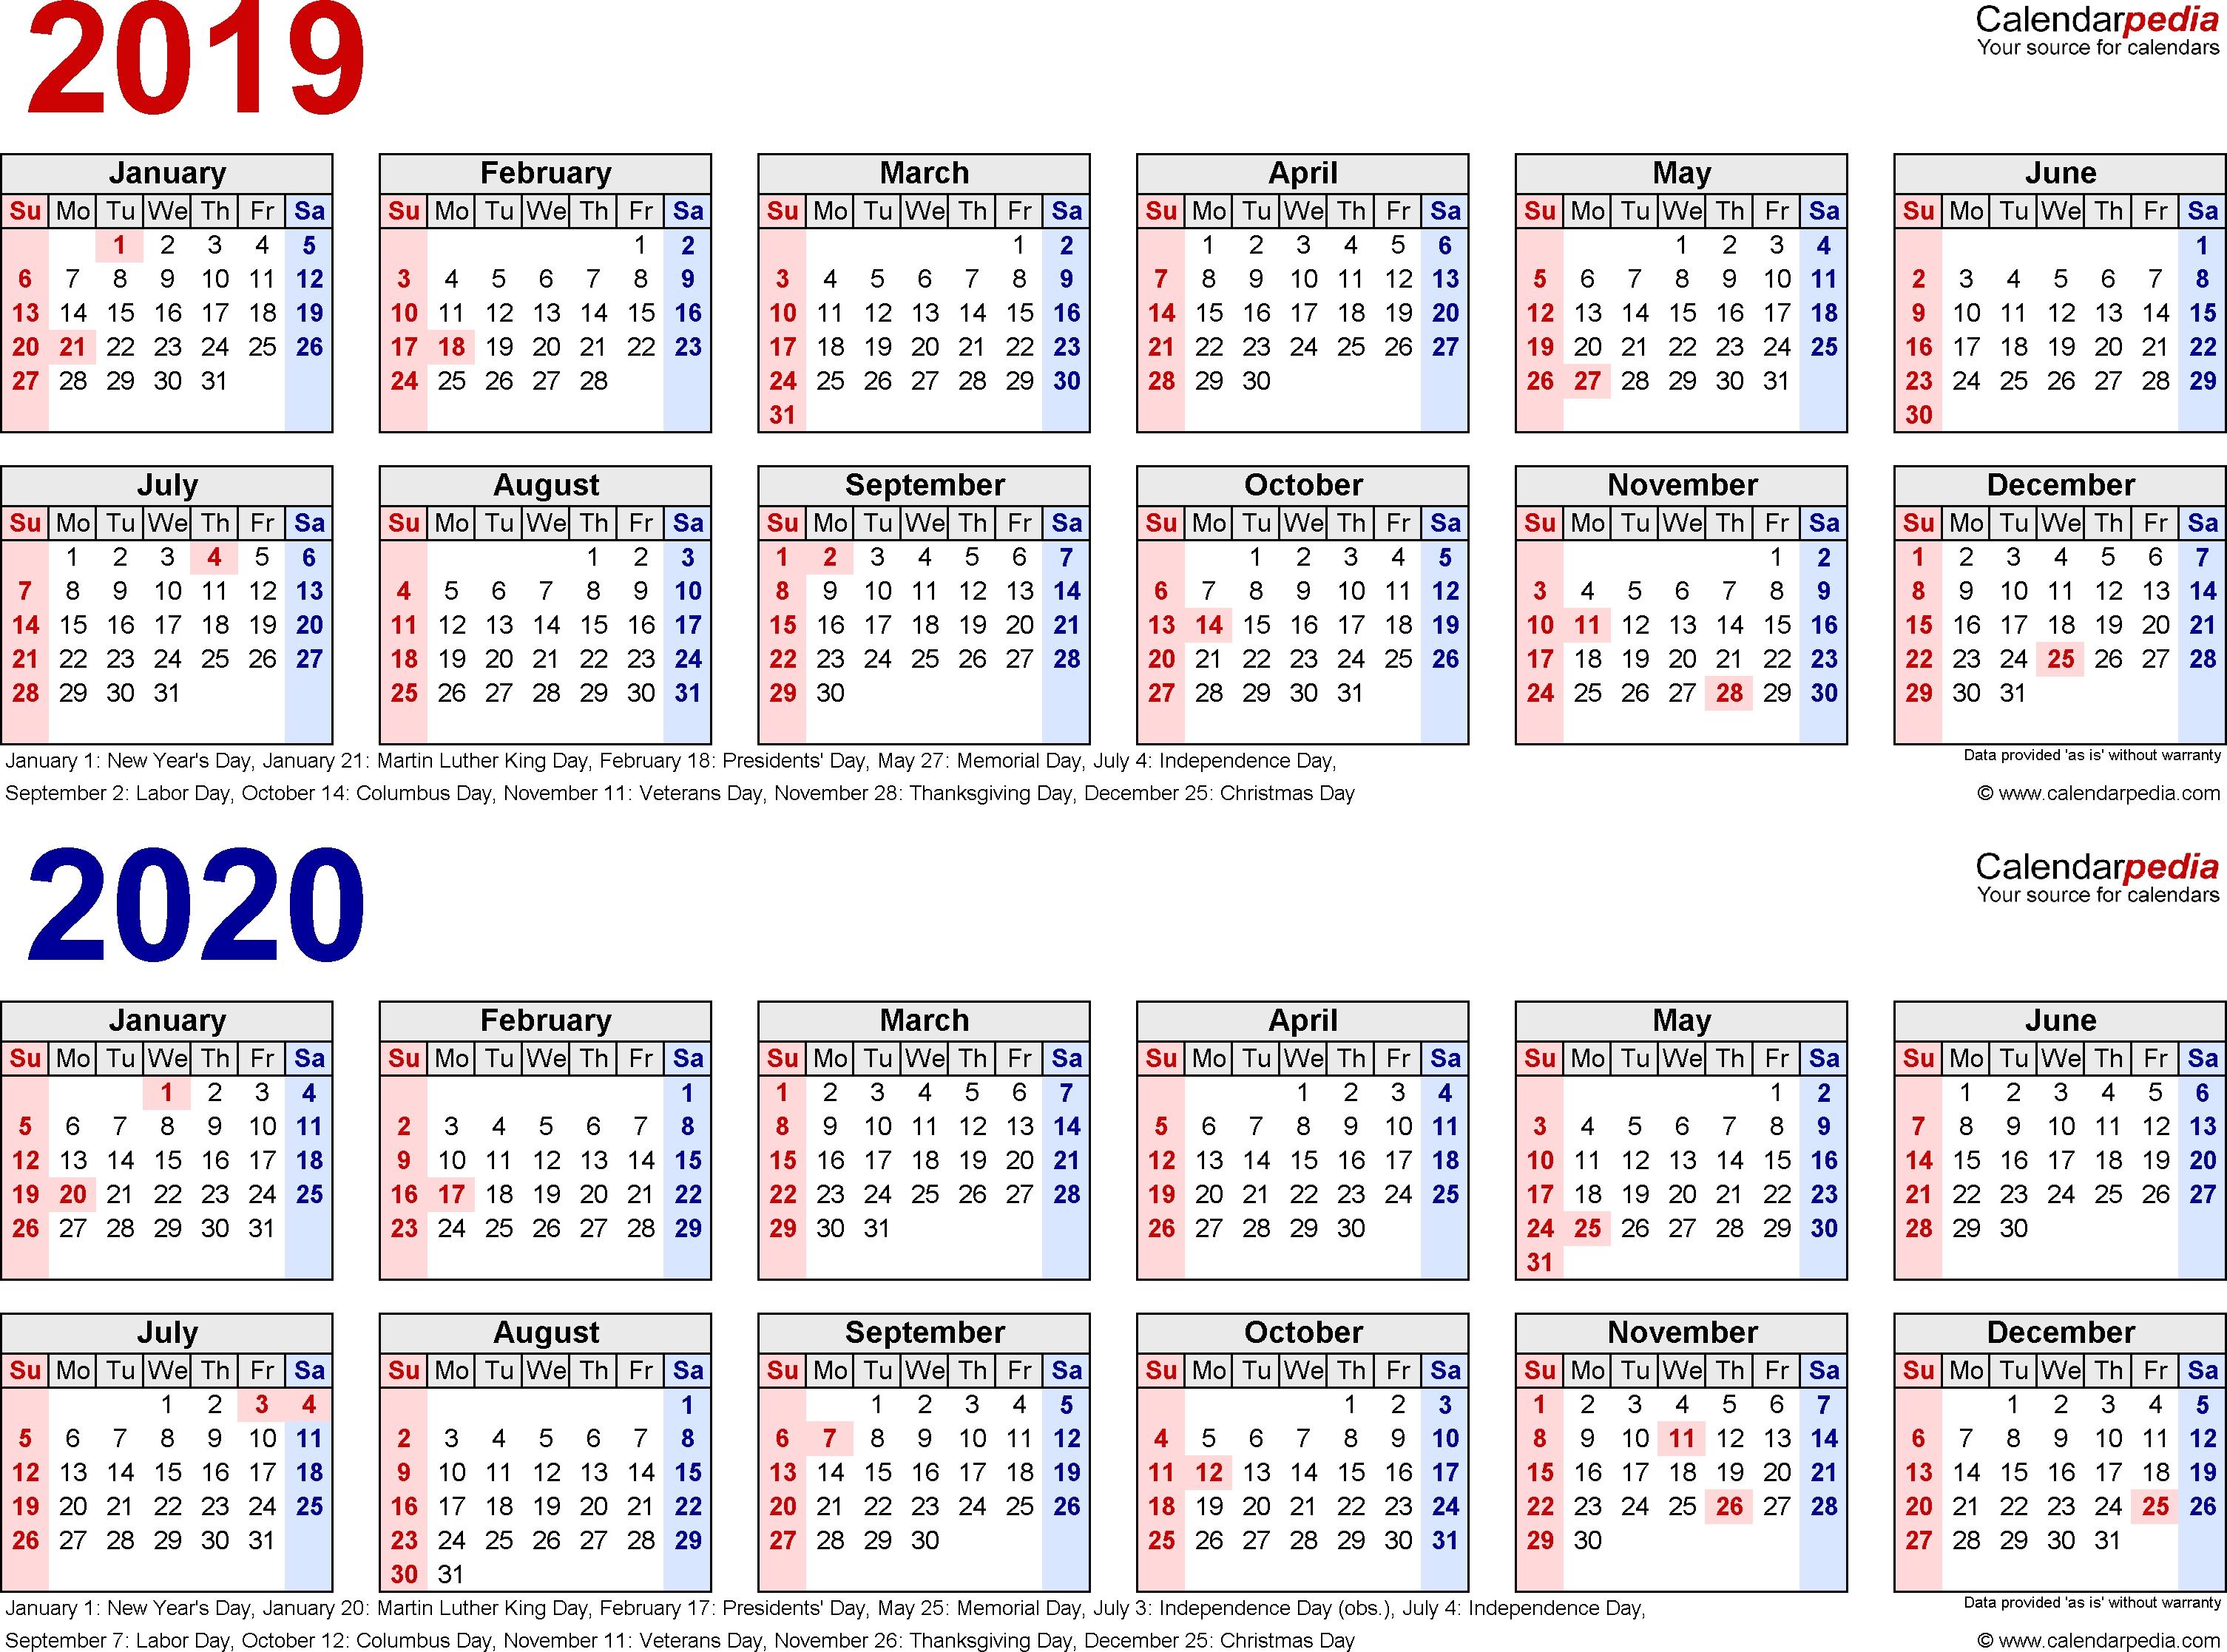 Bengali Calendar 2019 January - Google Search-January 2020 Islamic Calendar